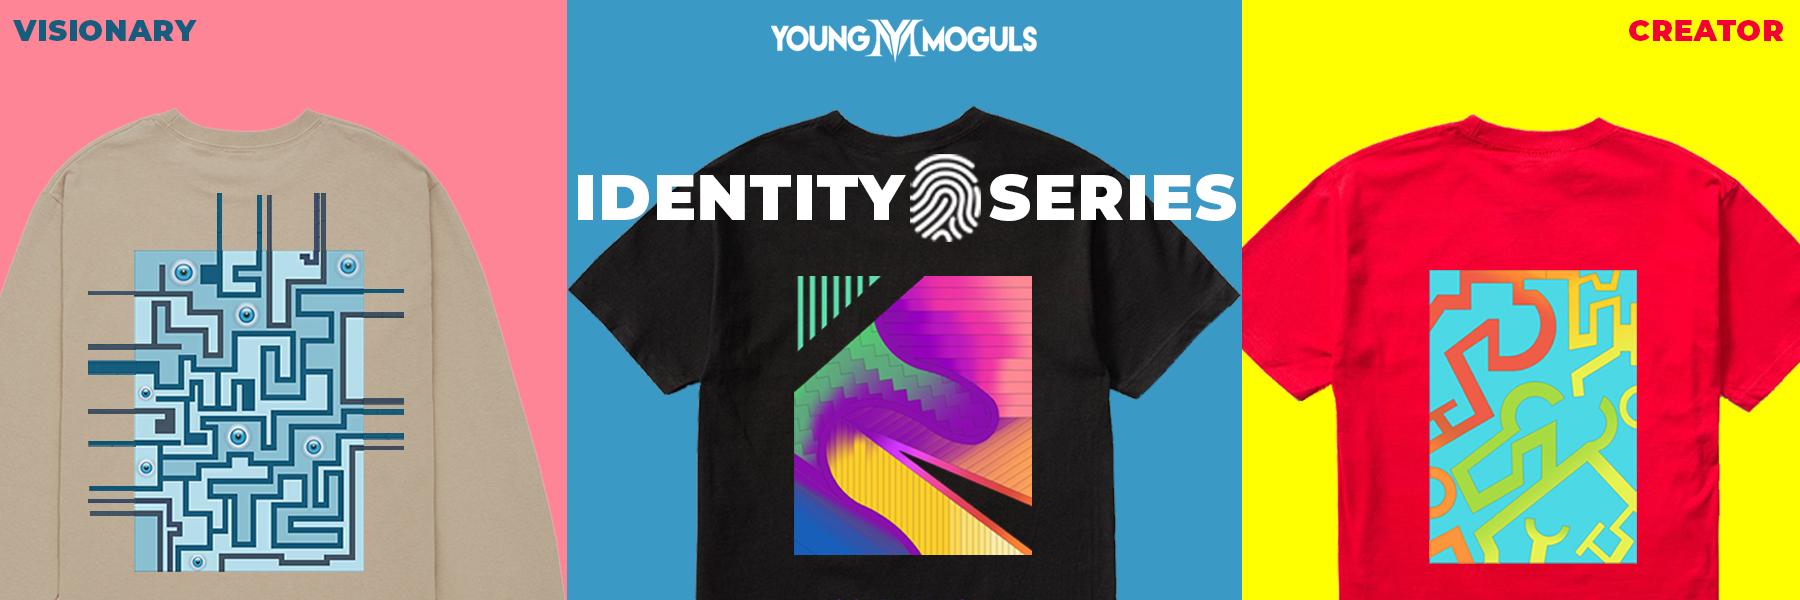 Identity Series Banner.jpg